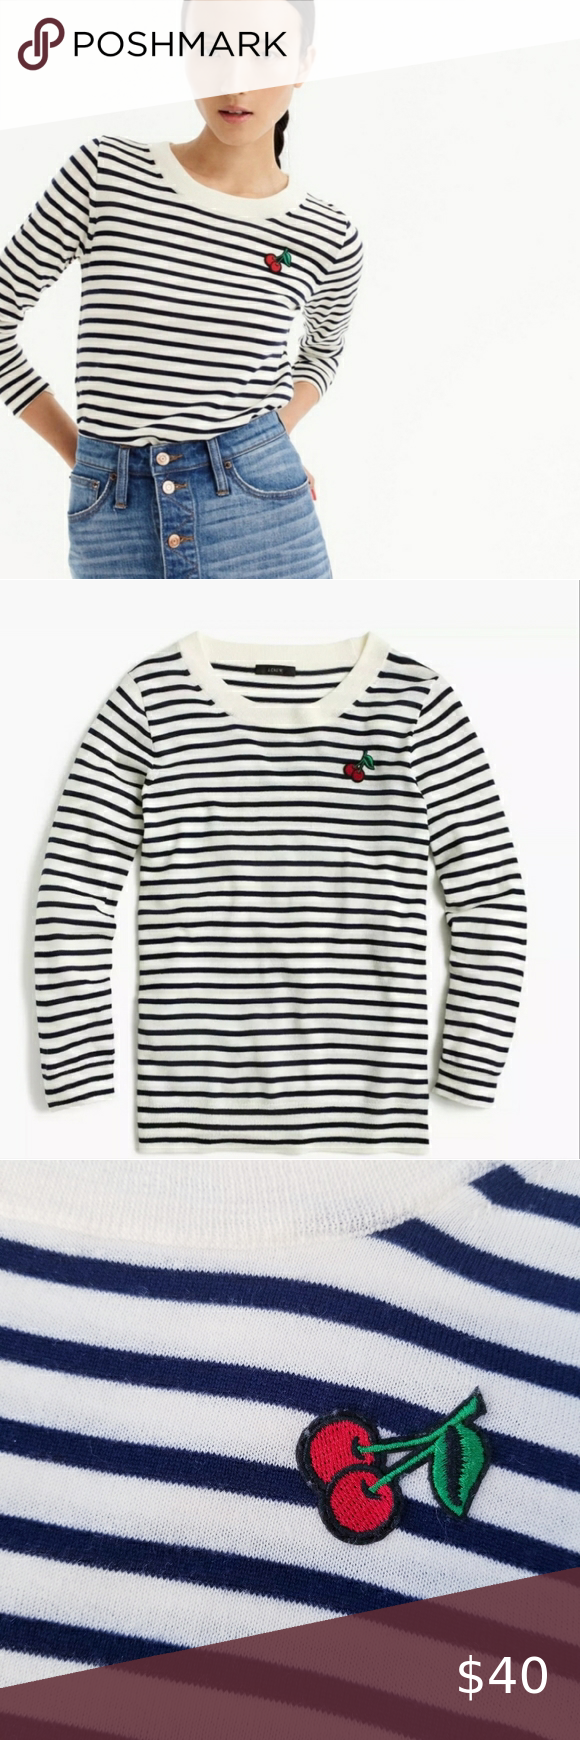 J Crew Cherry Stripe Tippi Sweater M Tippi Sweater Pink Cashmere Sweater Crew Neck Pullover Sweater [ 1740 x 580 Pixel ]